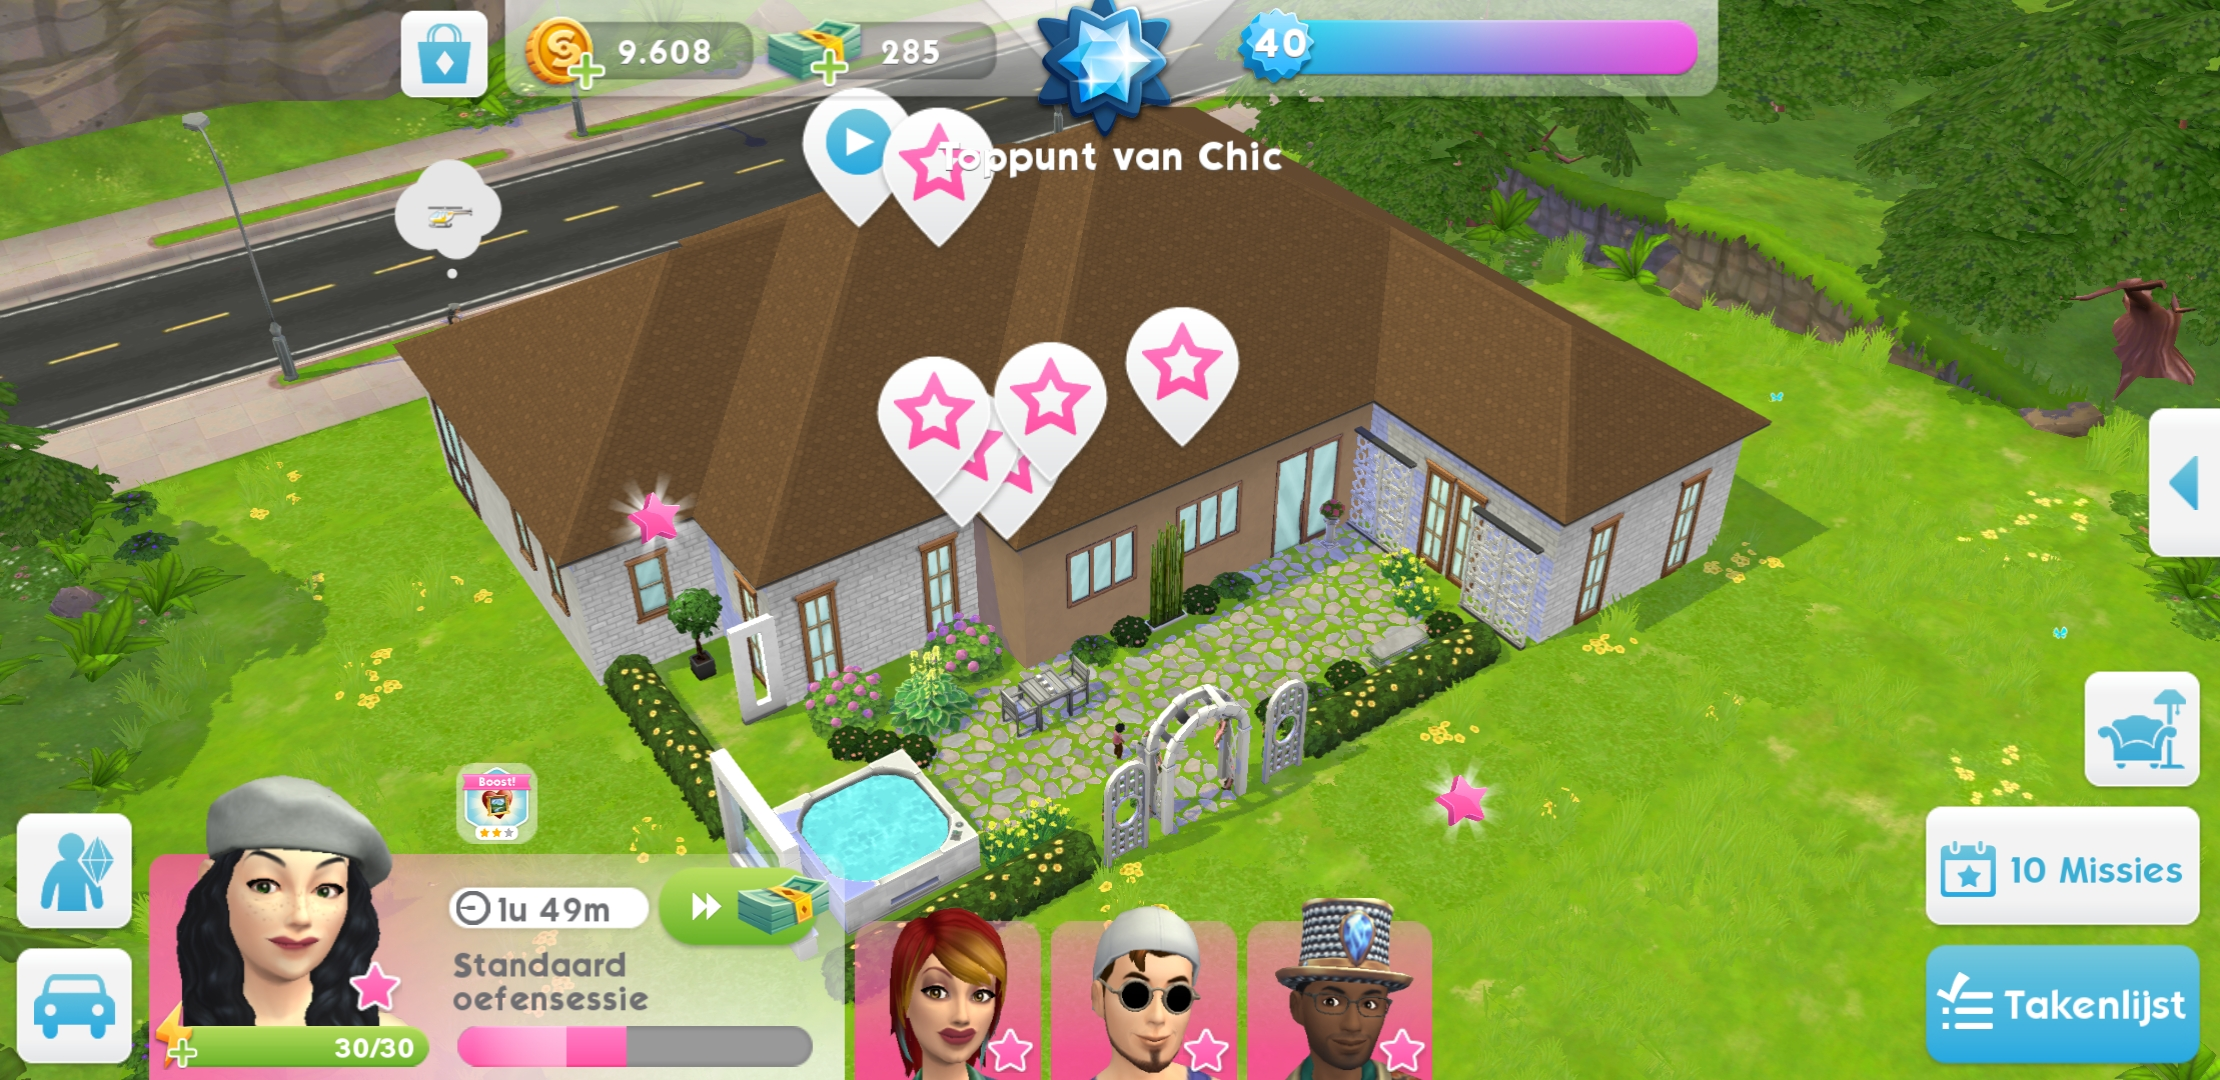 Screenshot_20180617_084927_The_Sims.jpg